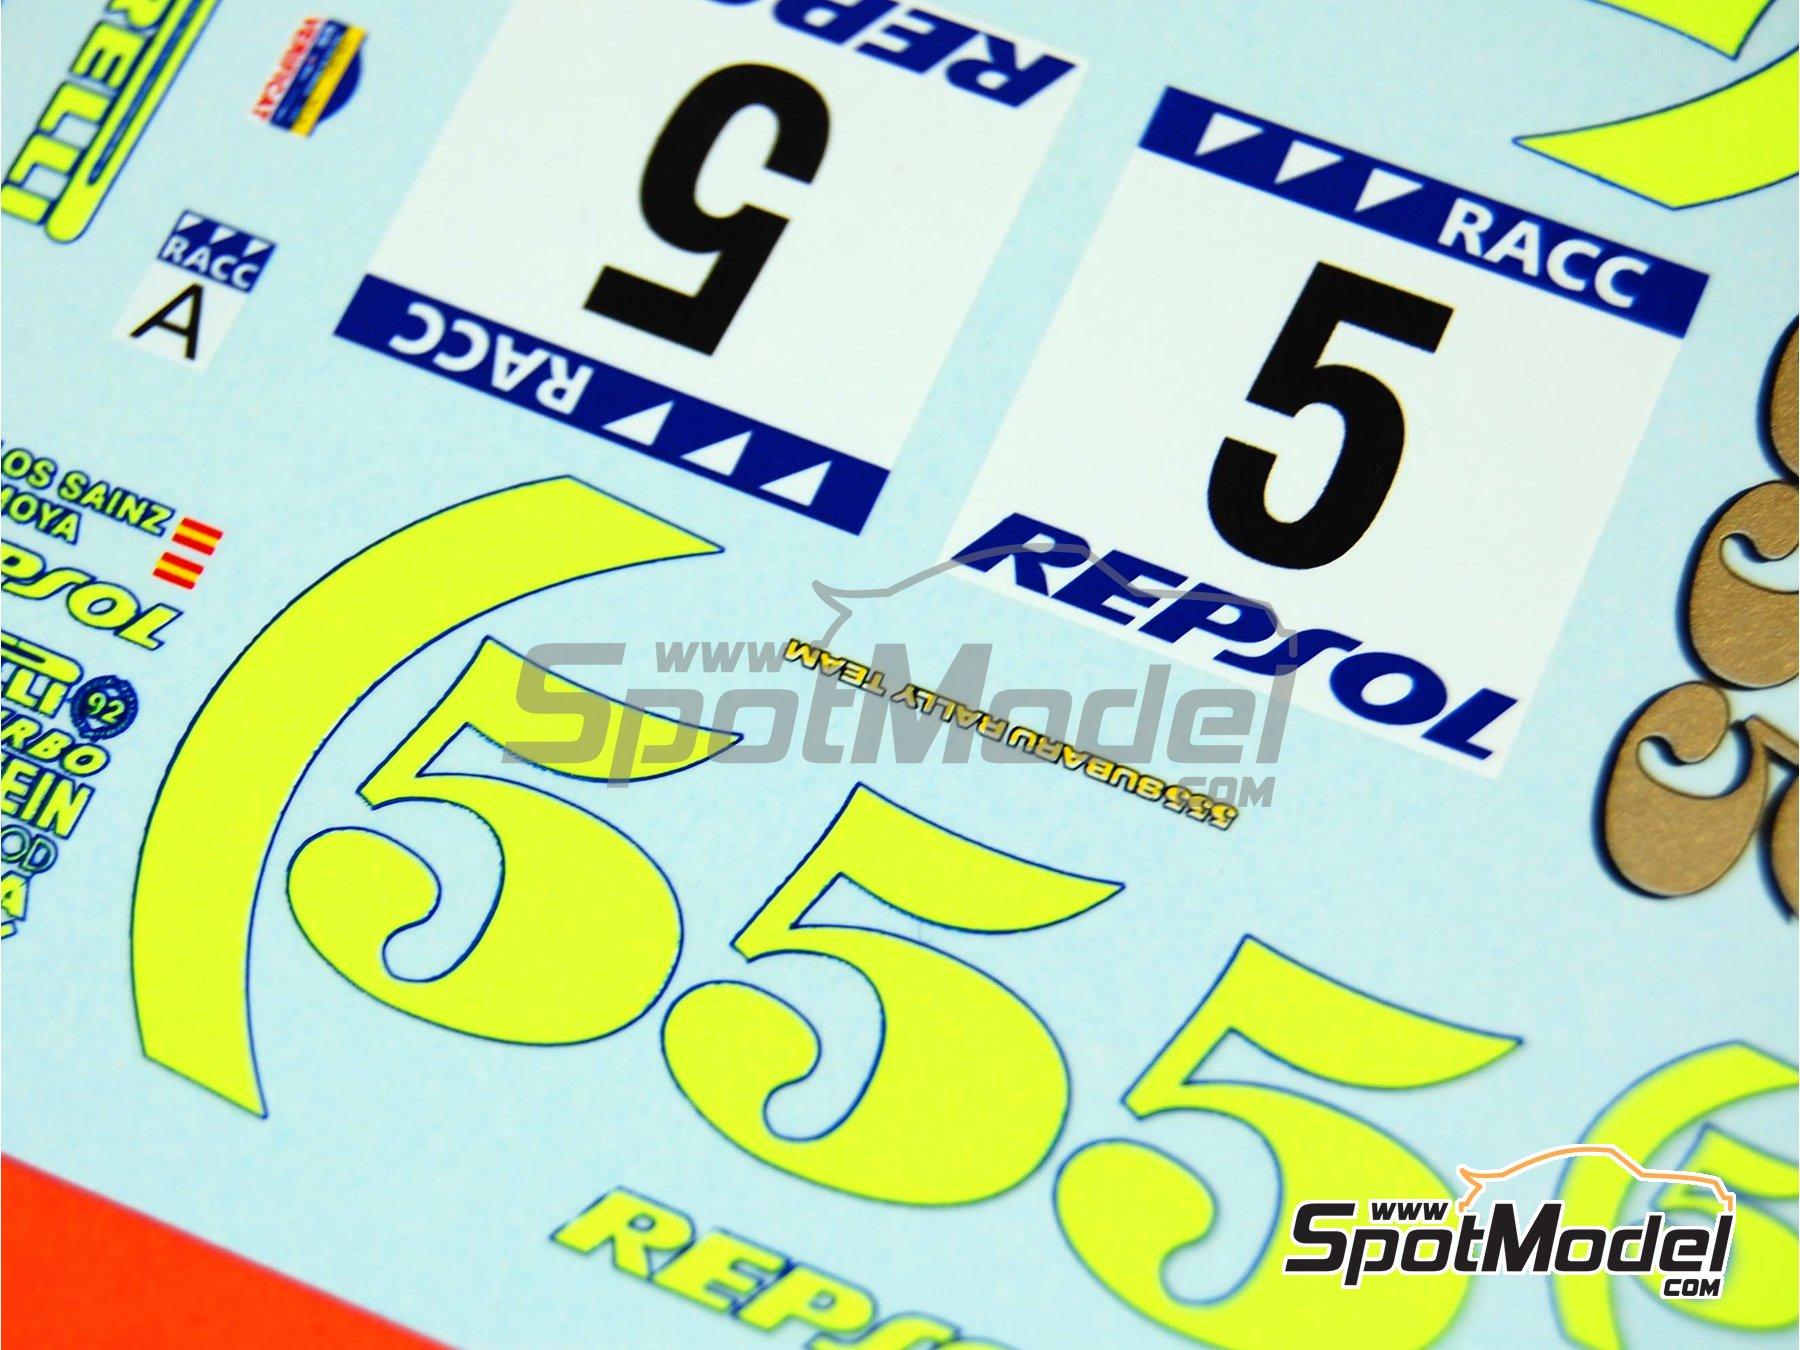 Image 15: Subaru Impreza 555 Group A - Catalunya Costa Dorada RACC Rally, RAC Rally 1995 | Marking / livery in 1/24 scale manufactured by Renaissance Models (ref.TK24-289)